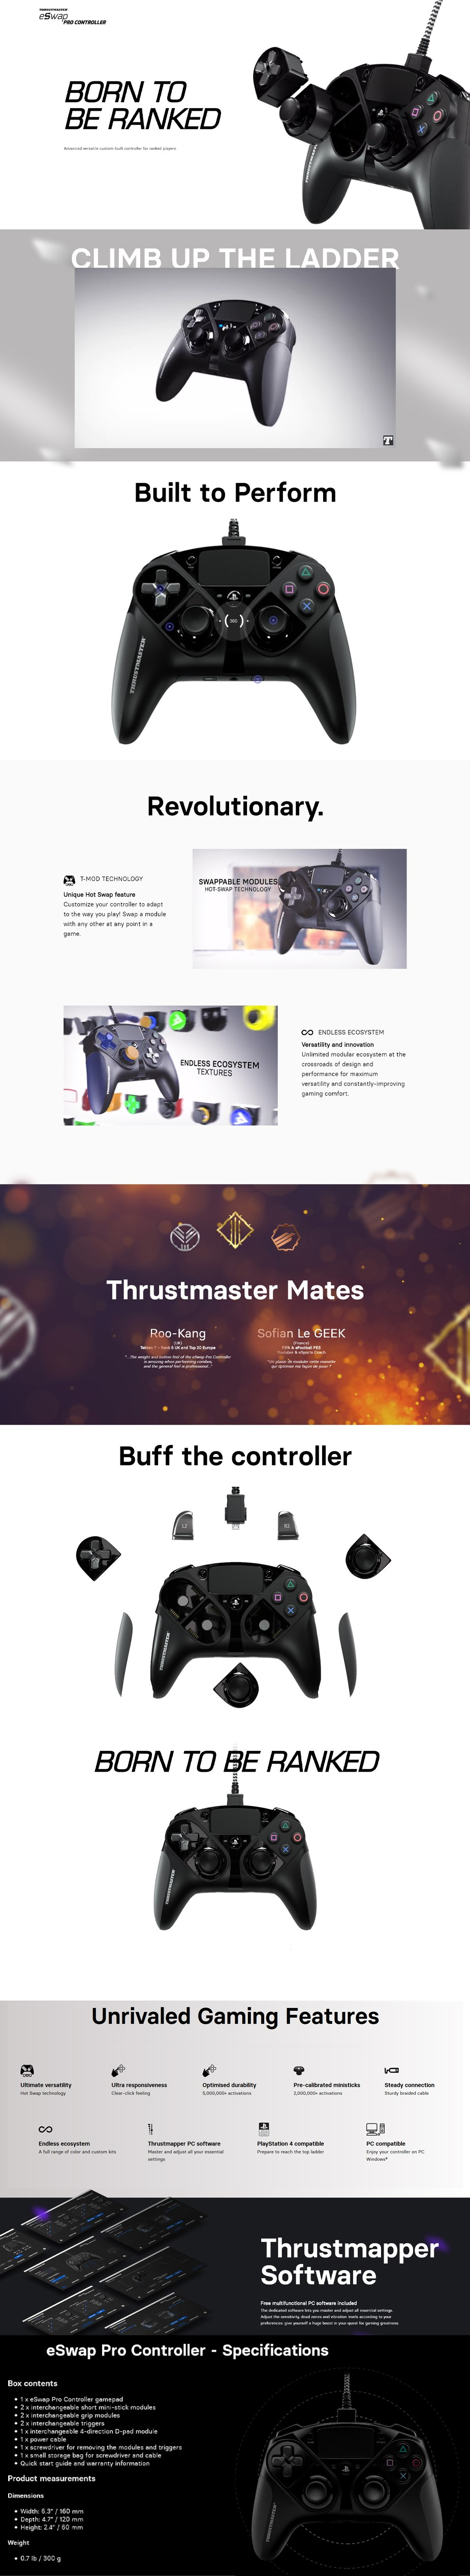 thrustmaster_eswap_modular_wired_pro_controller_black_ac28511_2.jpg